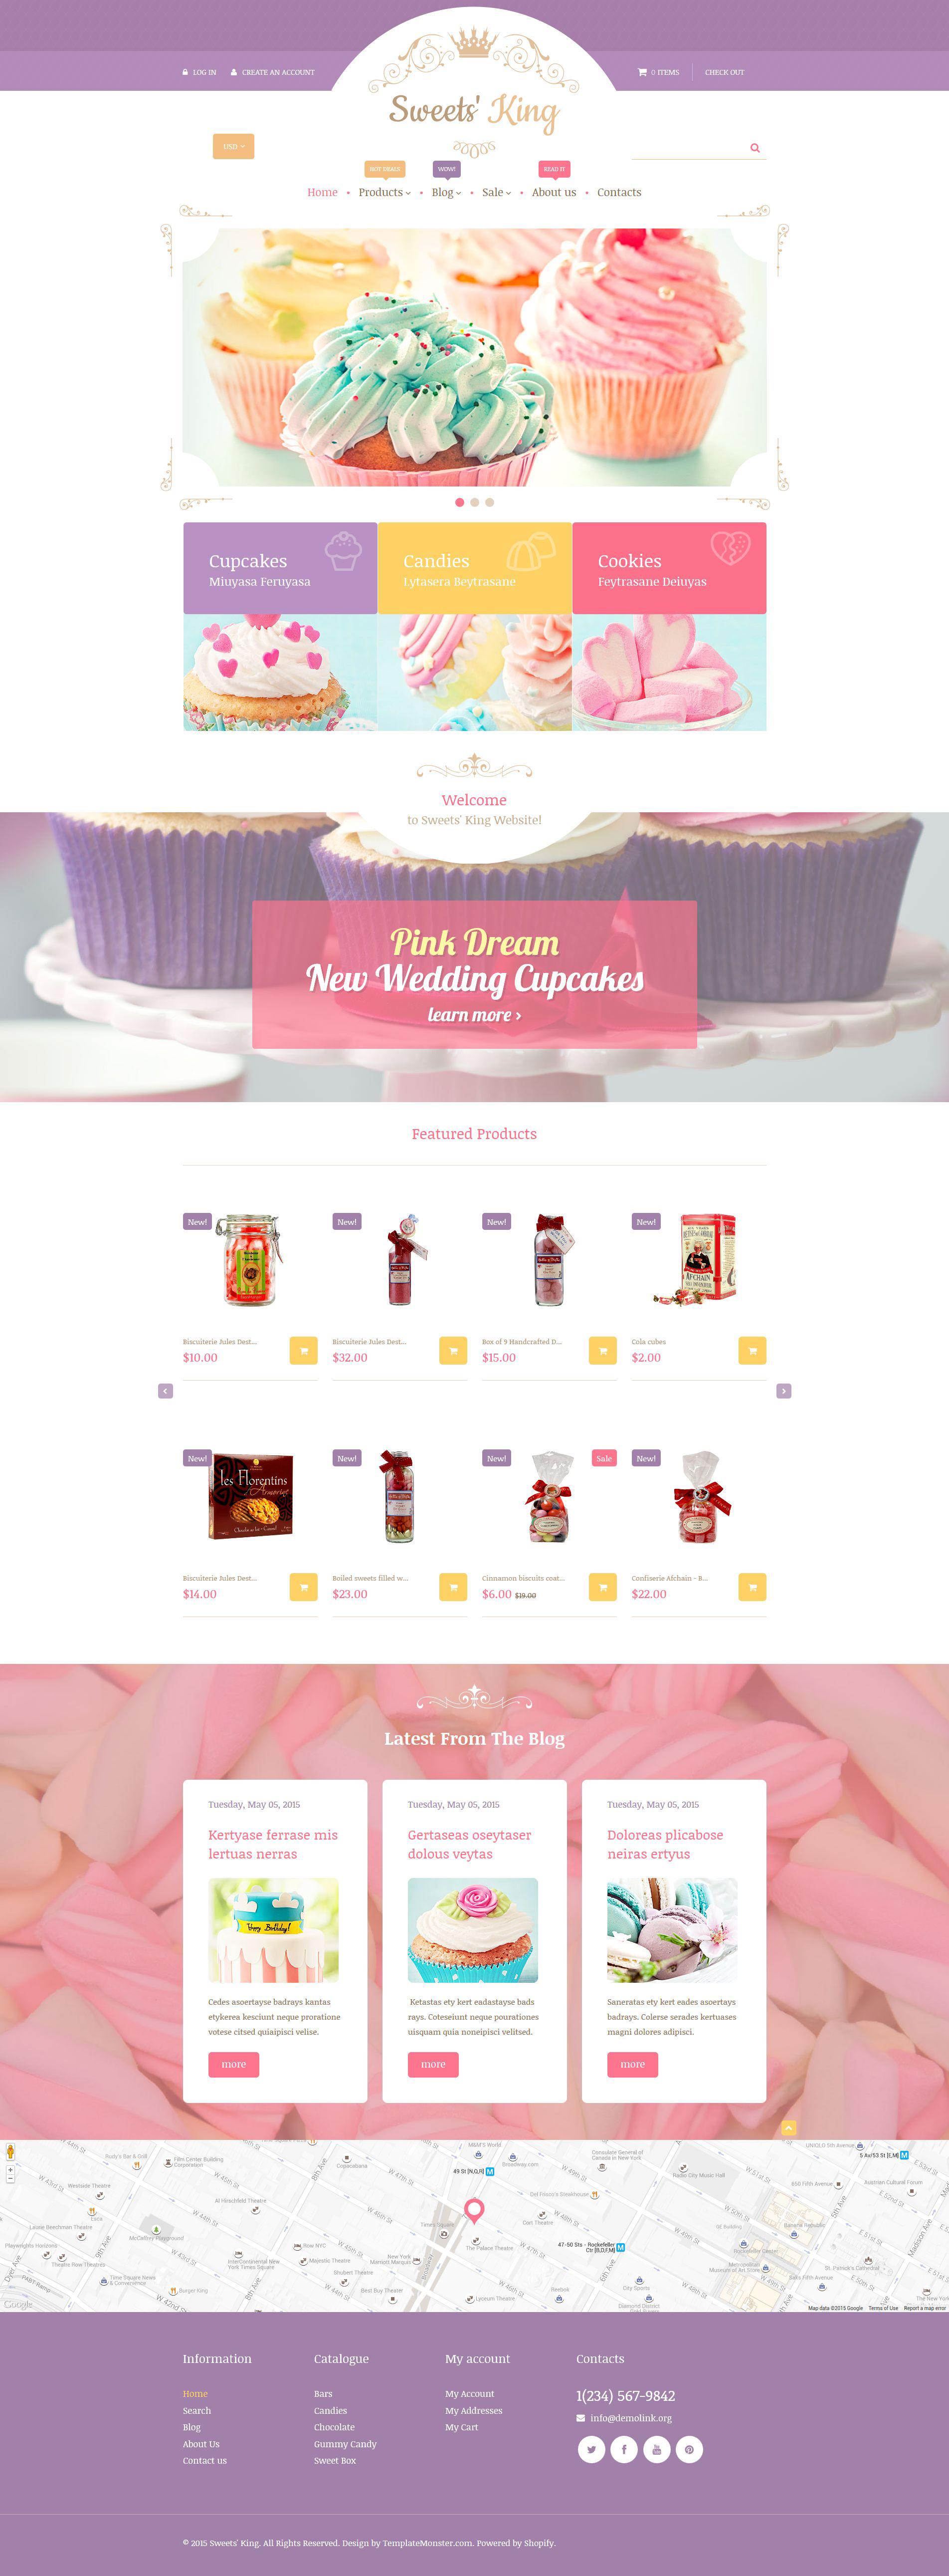 Sweets' King Shopify Theme - screenshot